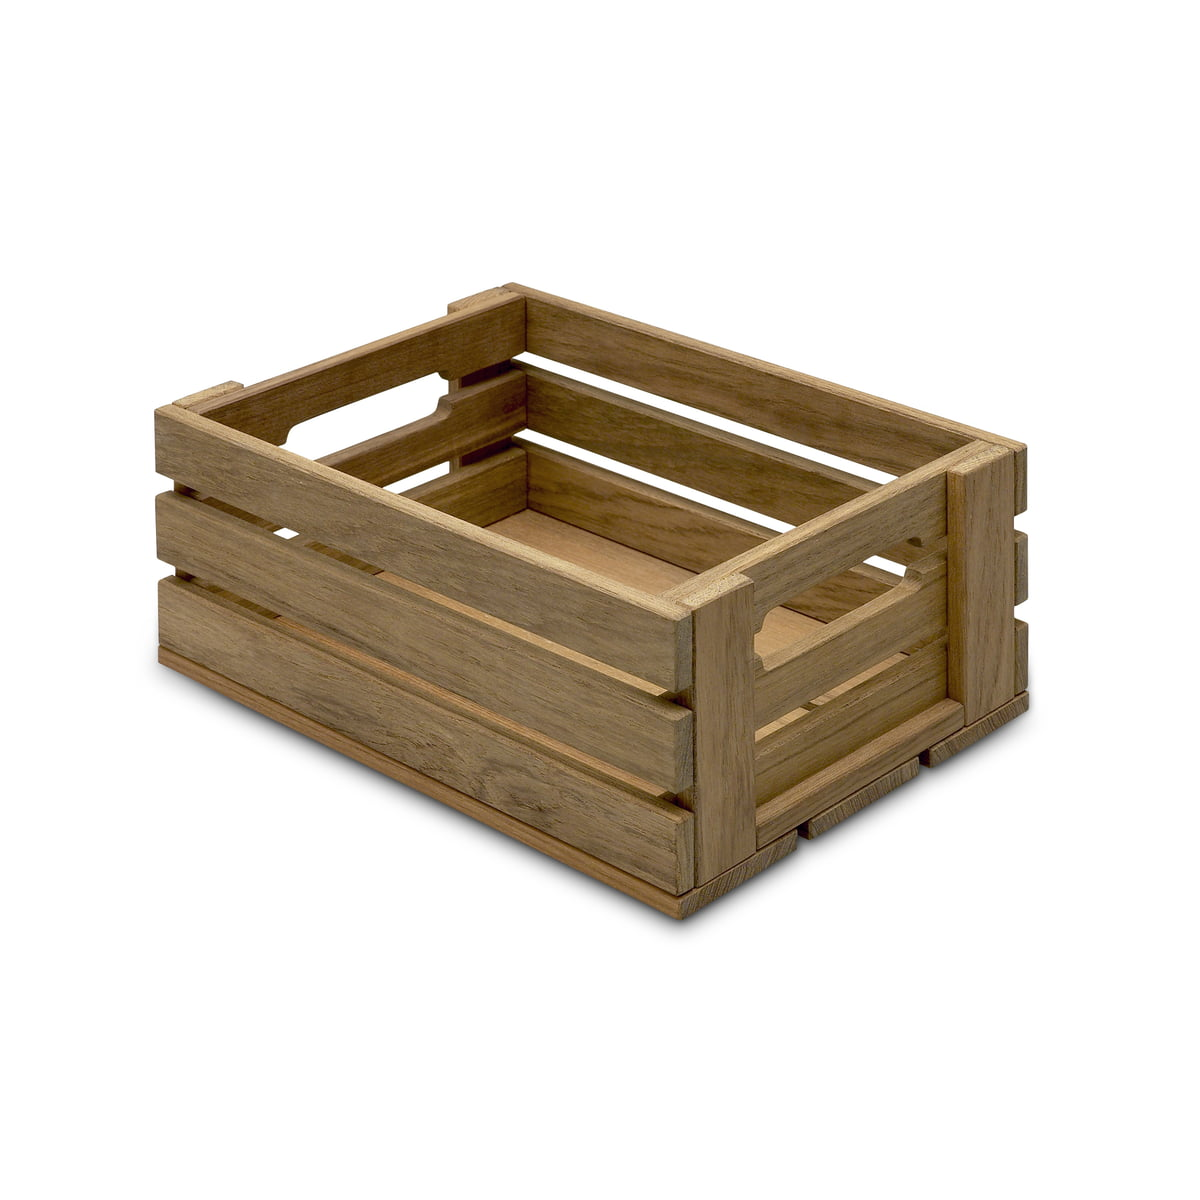 Skagerak - Dania Box 2, Teak Zwiebelkiste